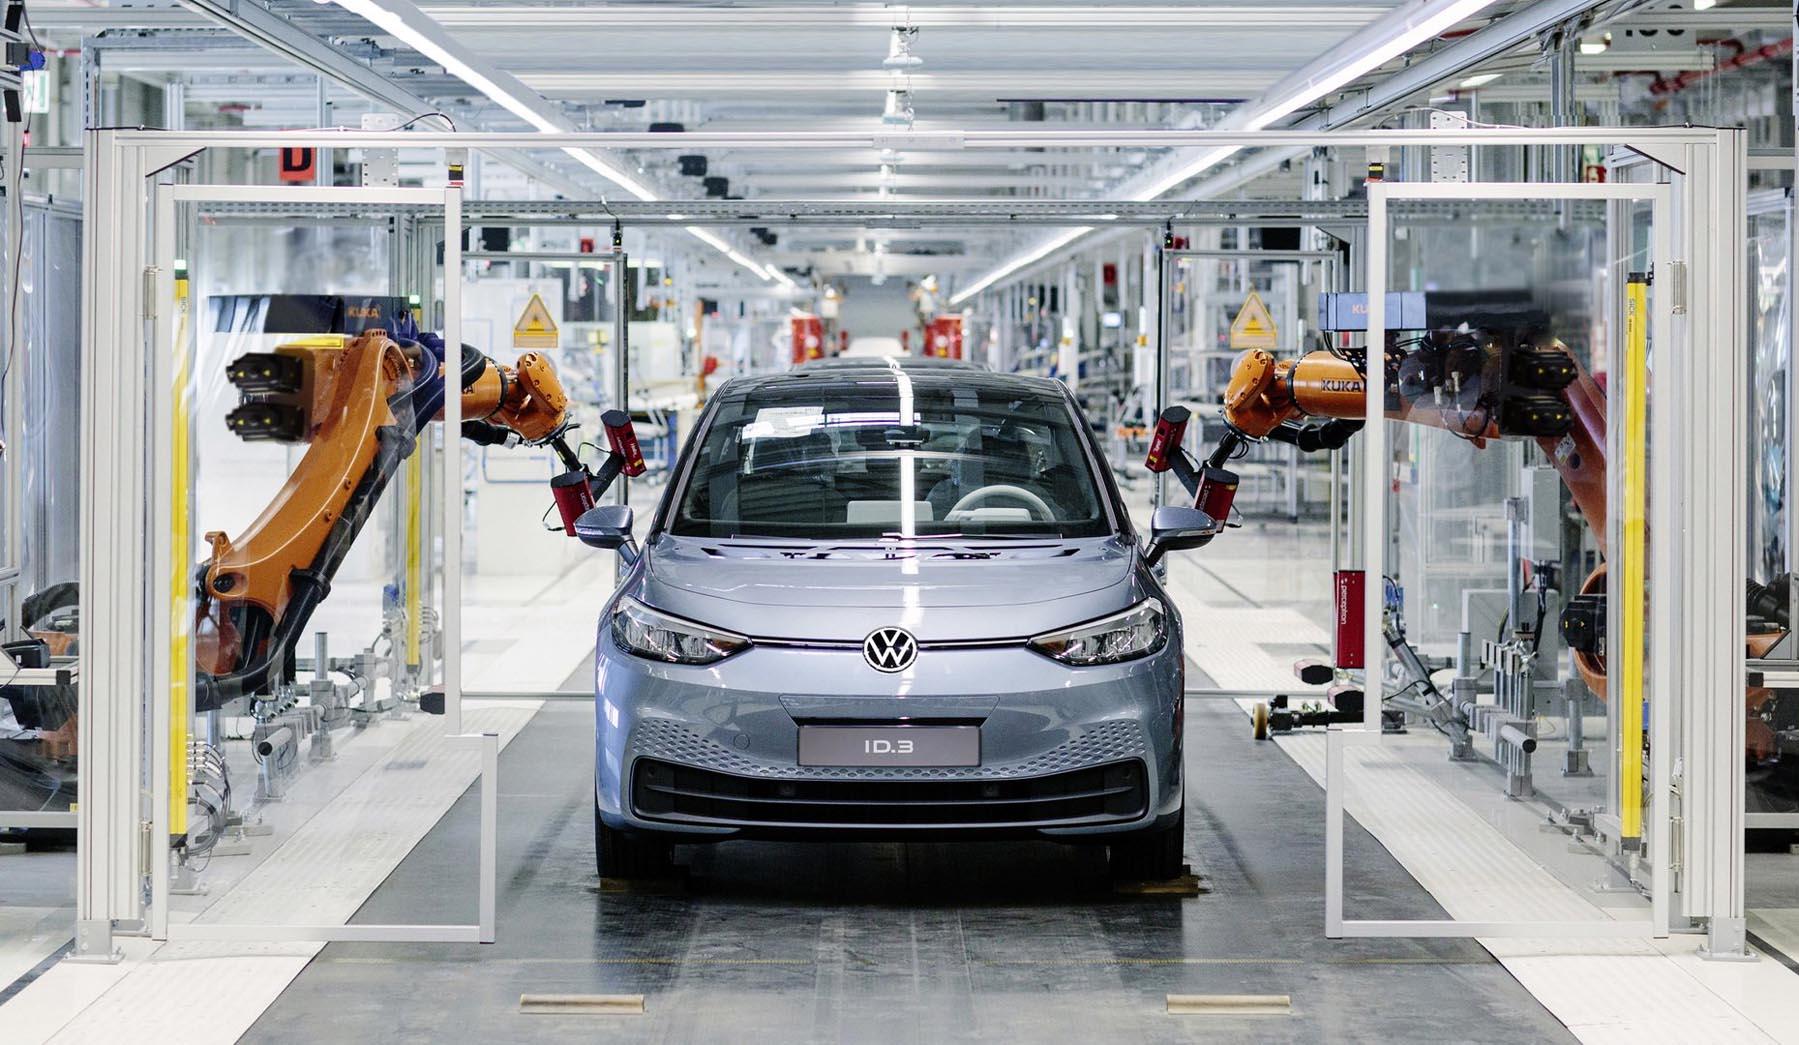 Volkswagen: Δίνει αυξήσεις στους εργαζόμενους αλλά αυτοί προτιμούν επιπλέον ρεπό!